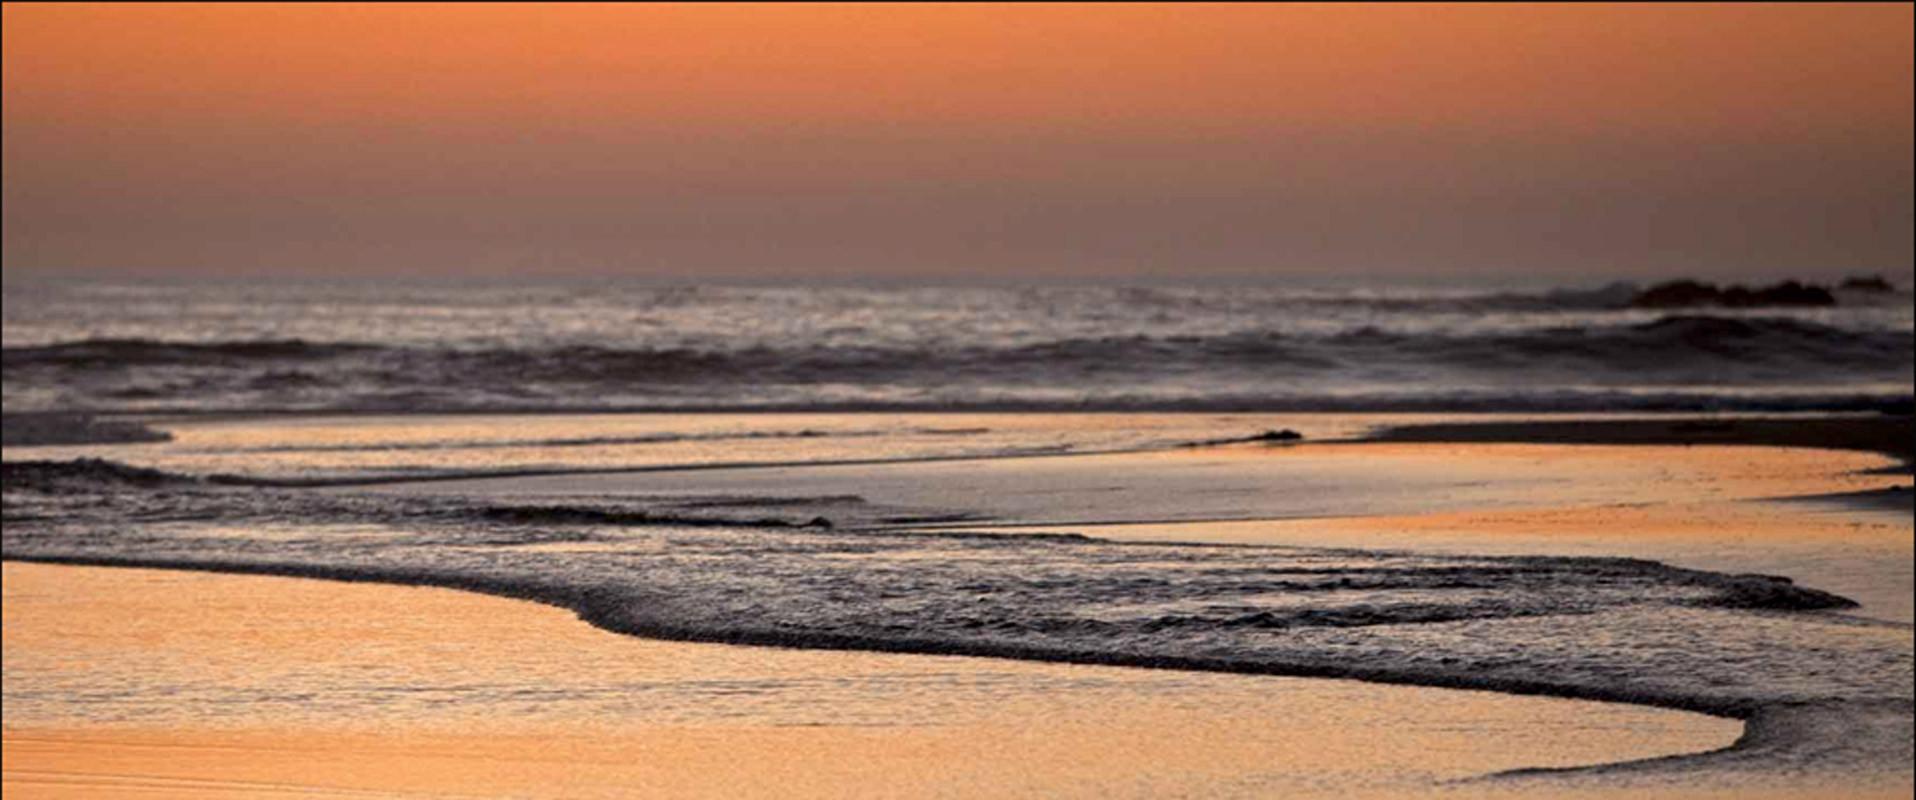 Saffron Skies 1 Big Sur California